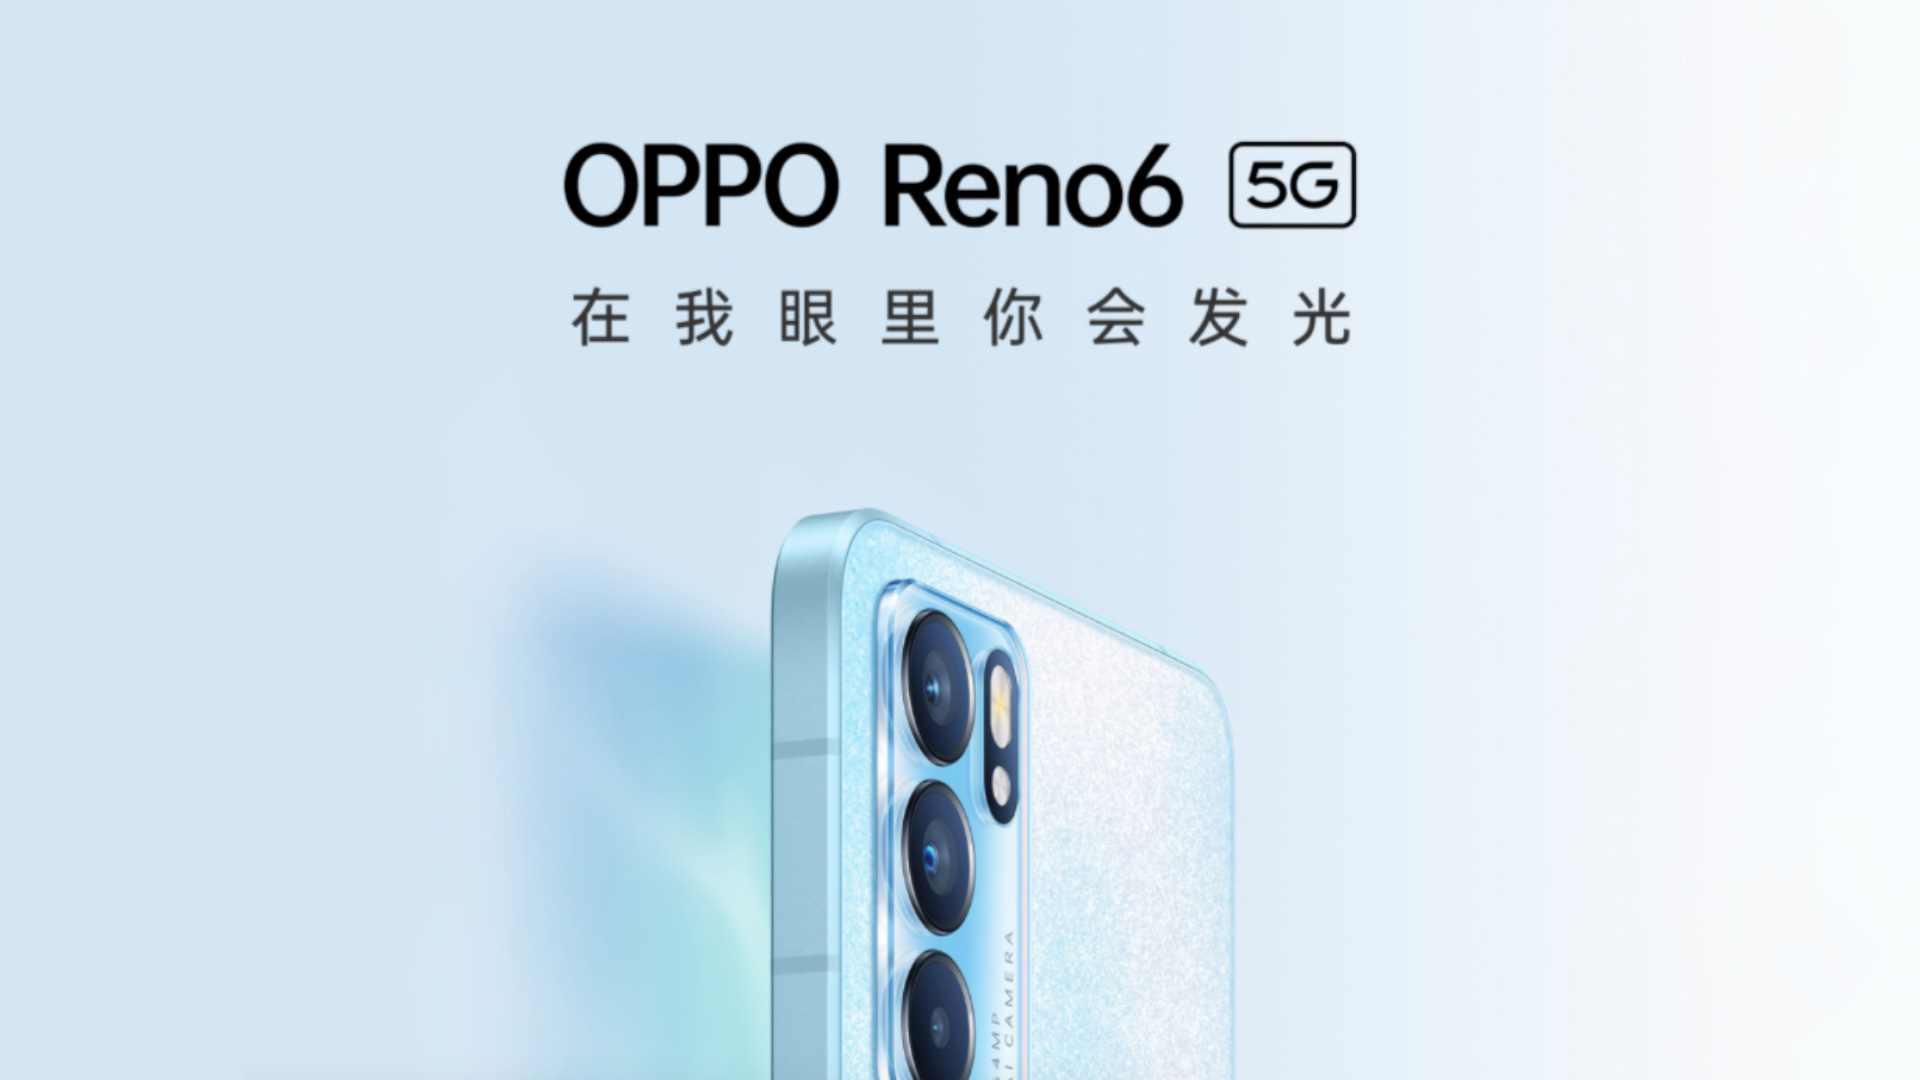 Google Camera for Oppo Reno 6